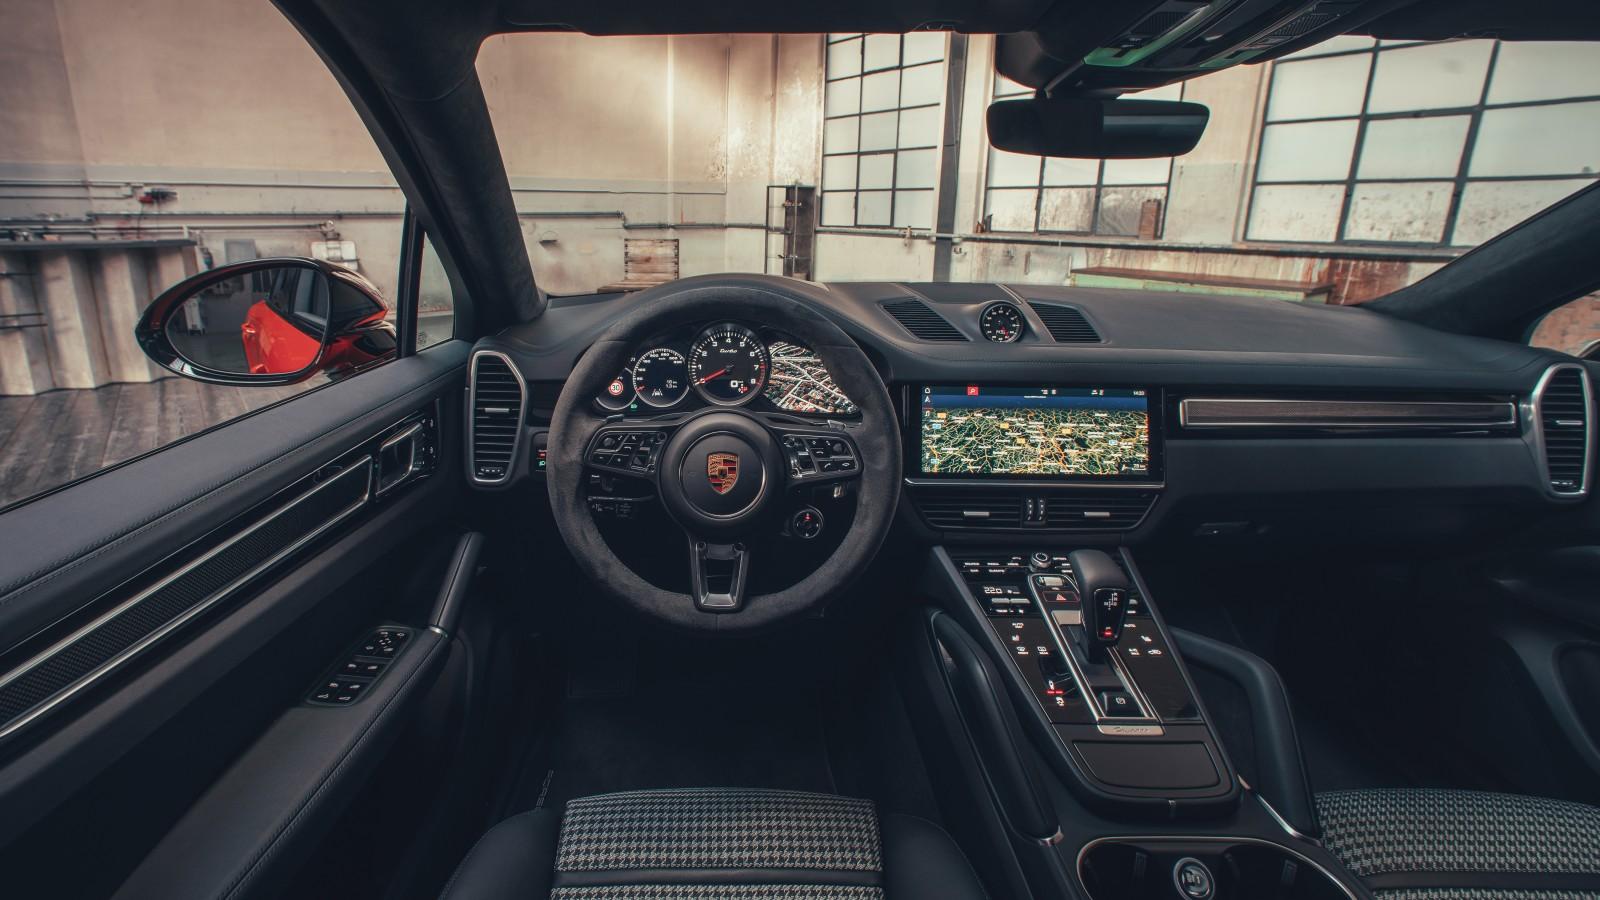 Audi Car Wallpapers Porsche Cayenne Turbo Coupe 2019 4k Interior Wallpaper